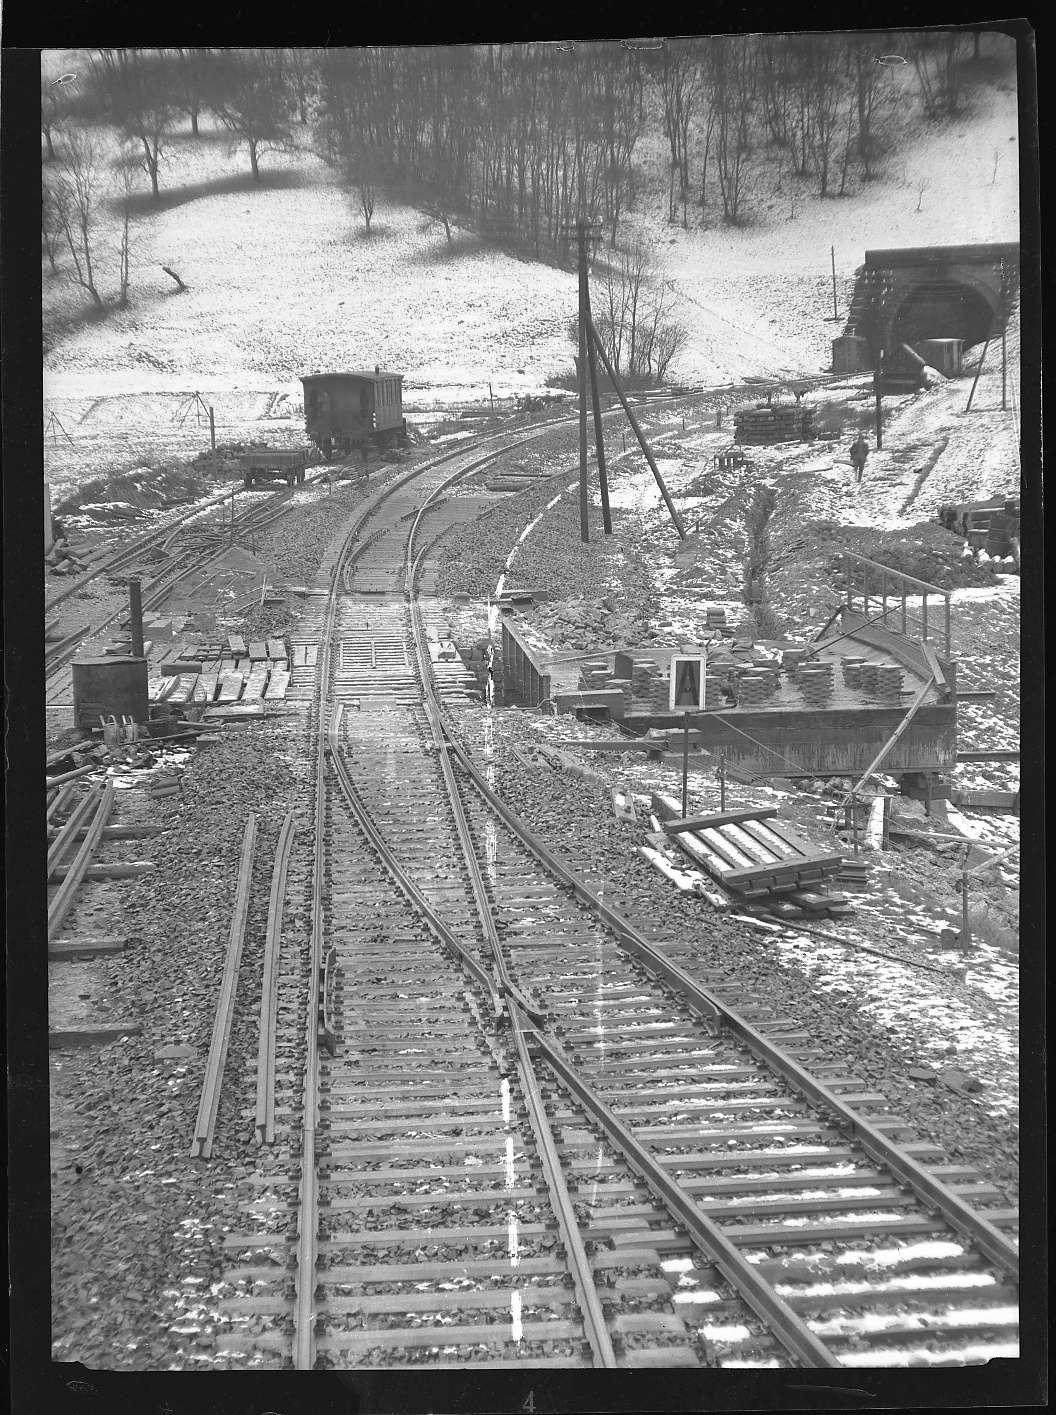 Gaildorf, Linienverbesserung beim Bf, Ausfahrt Richtung Käppelesbergtunnel, Abb. c